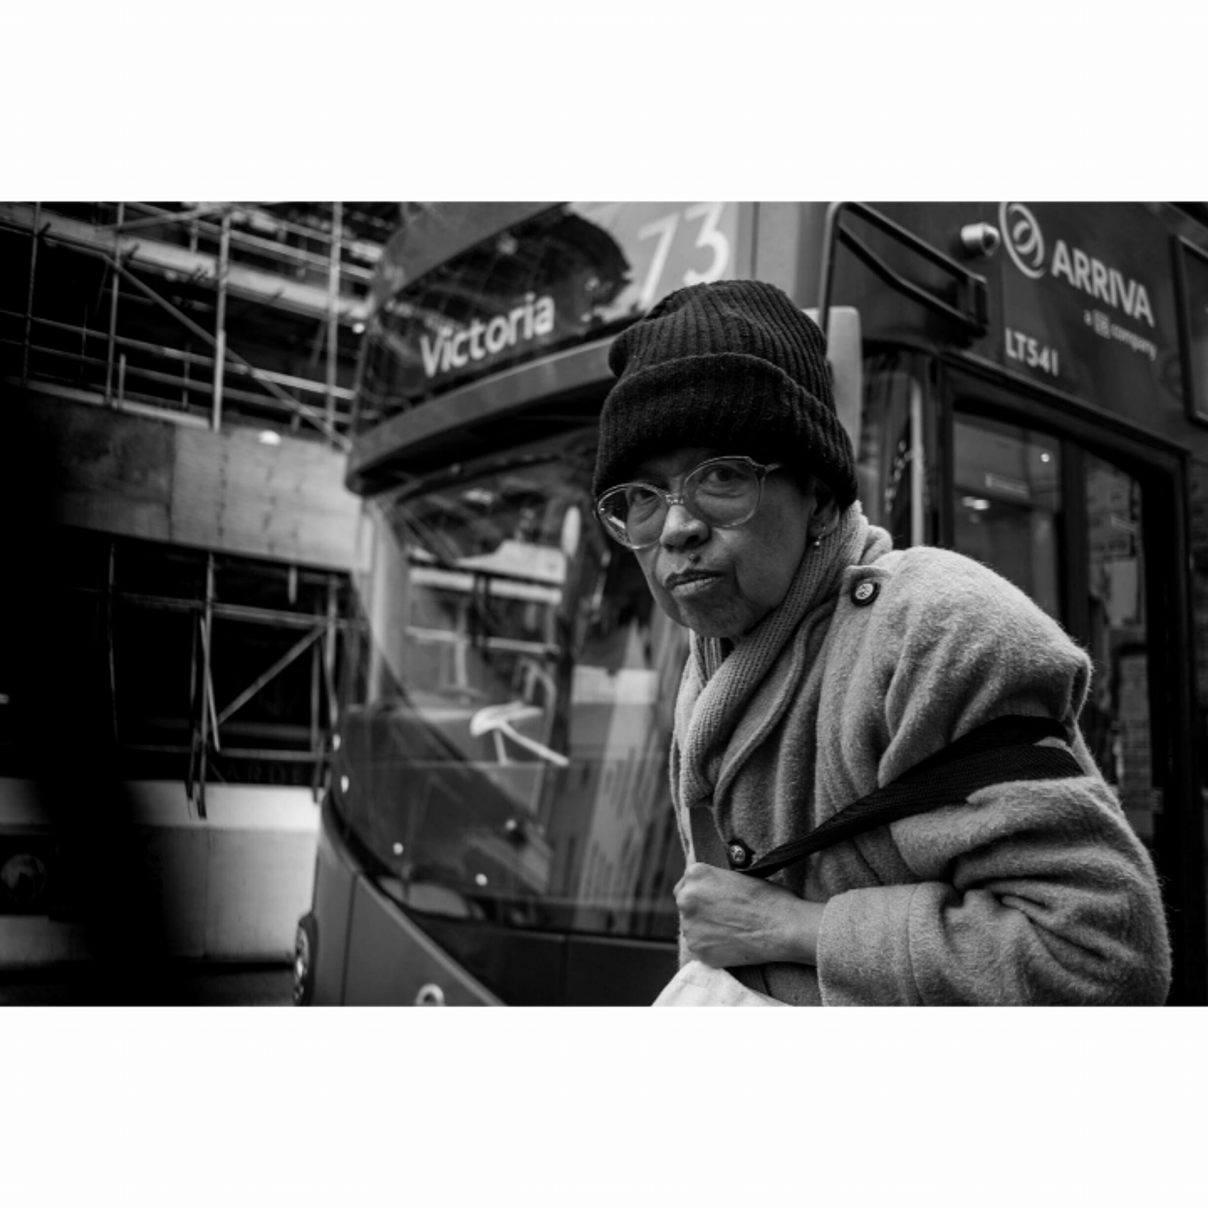 Portrait of old lady, London - January 2017